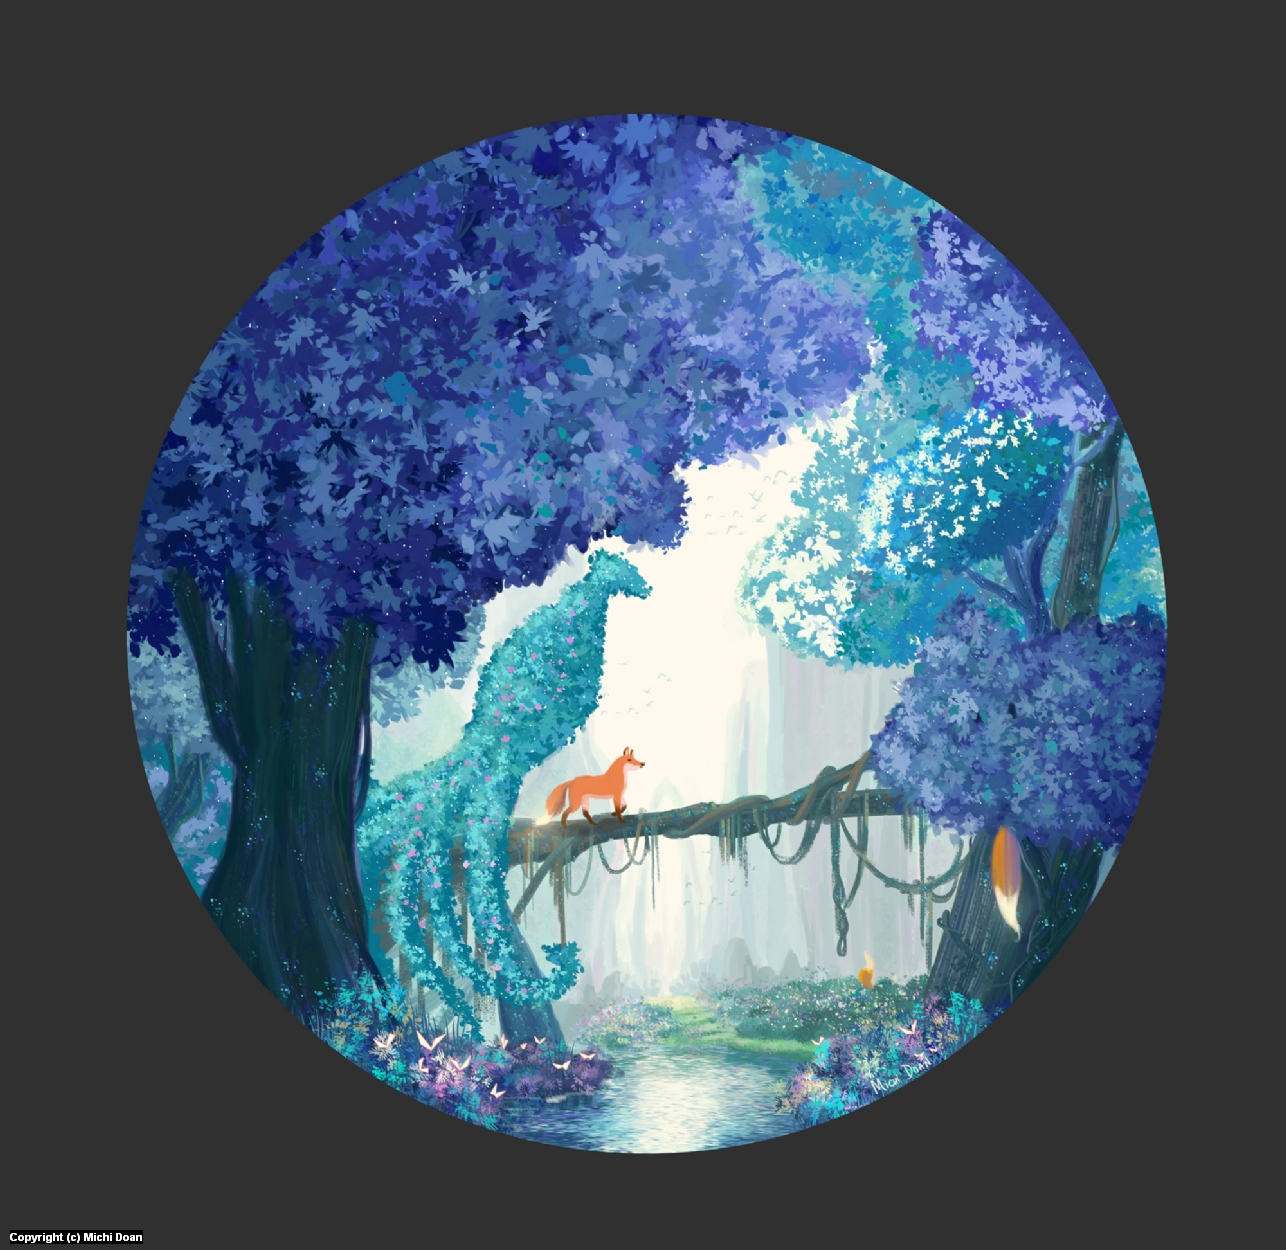 Enchantsia Forest Artwork by Michi Doan